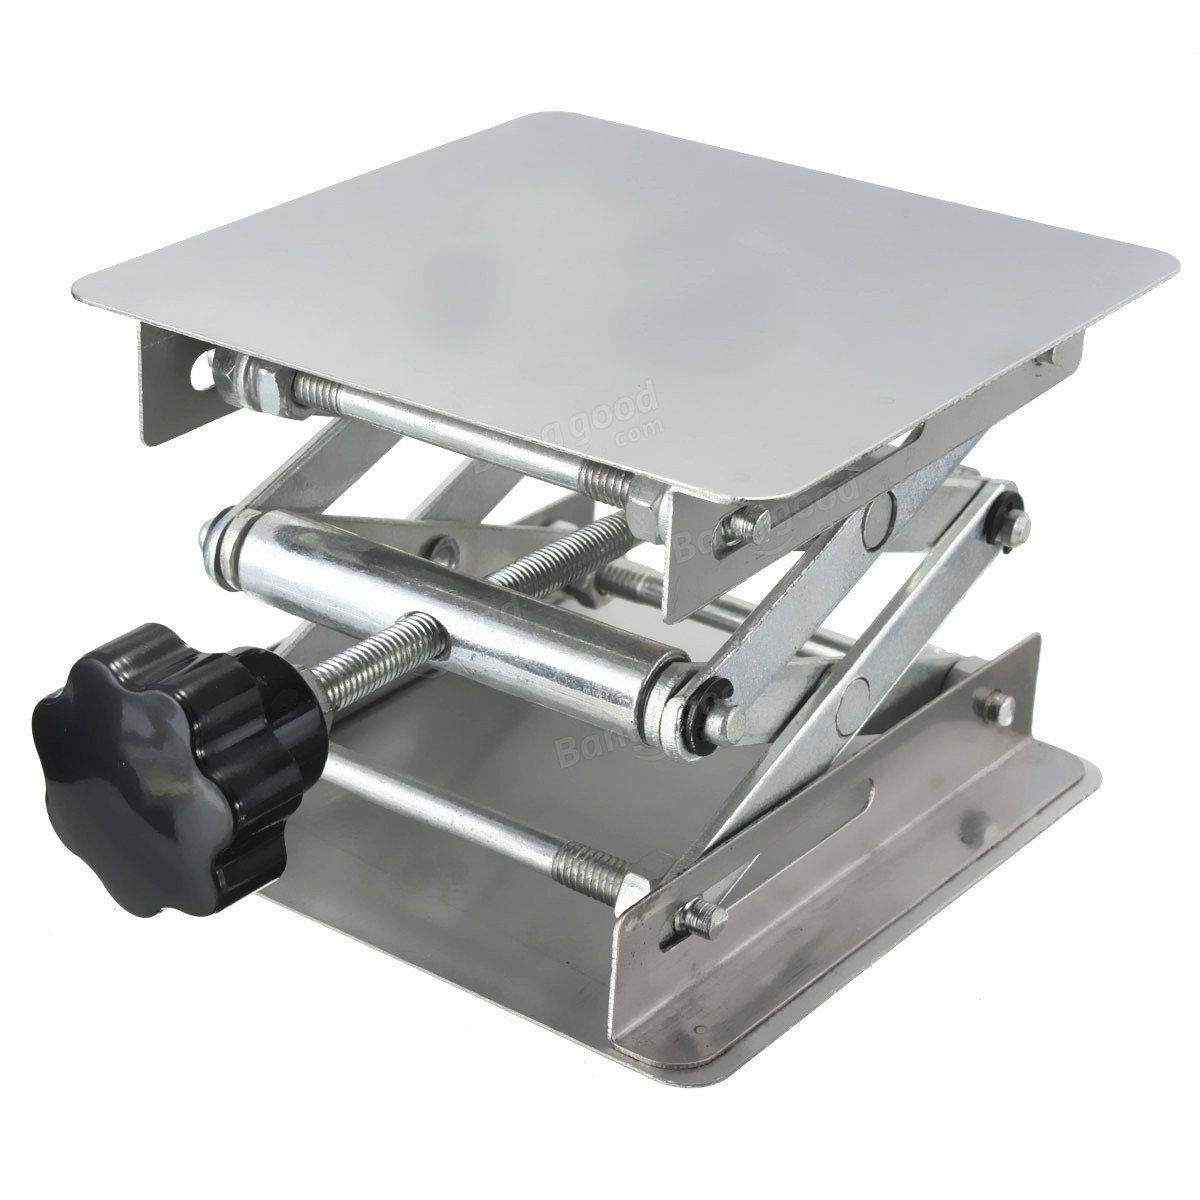 Laboratory lifts platform stand manual control 100x100x150mm laboratory lifts platform stand manual control 100x100x150mm router liftrouter tabletable keyboard keysfo Gallery